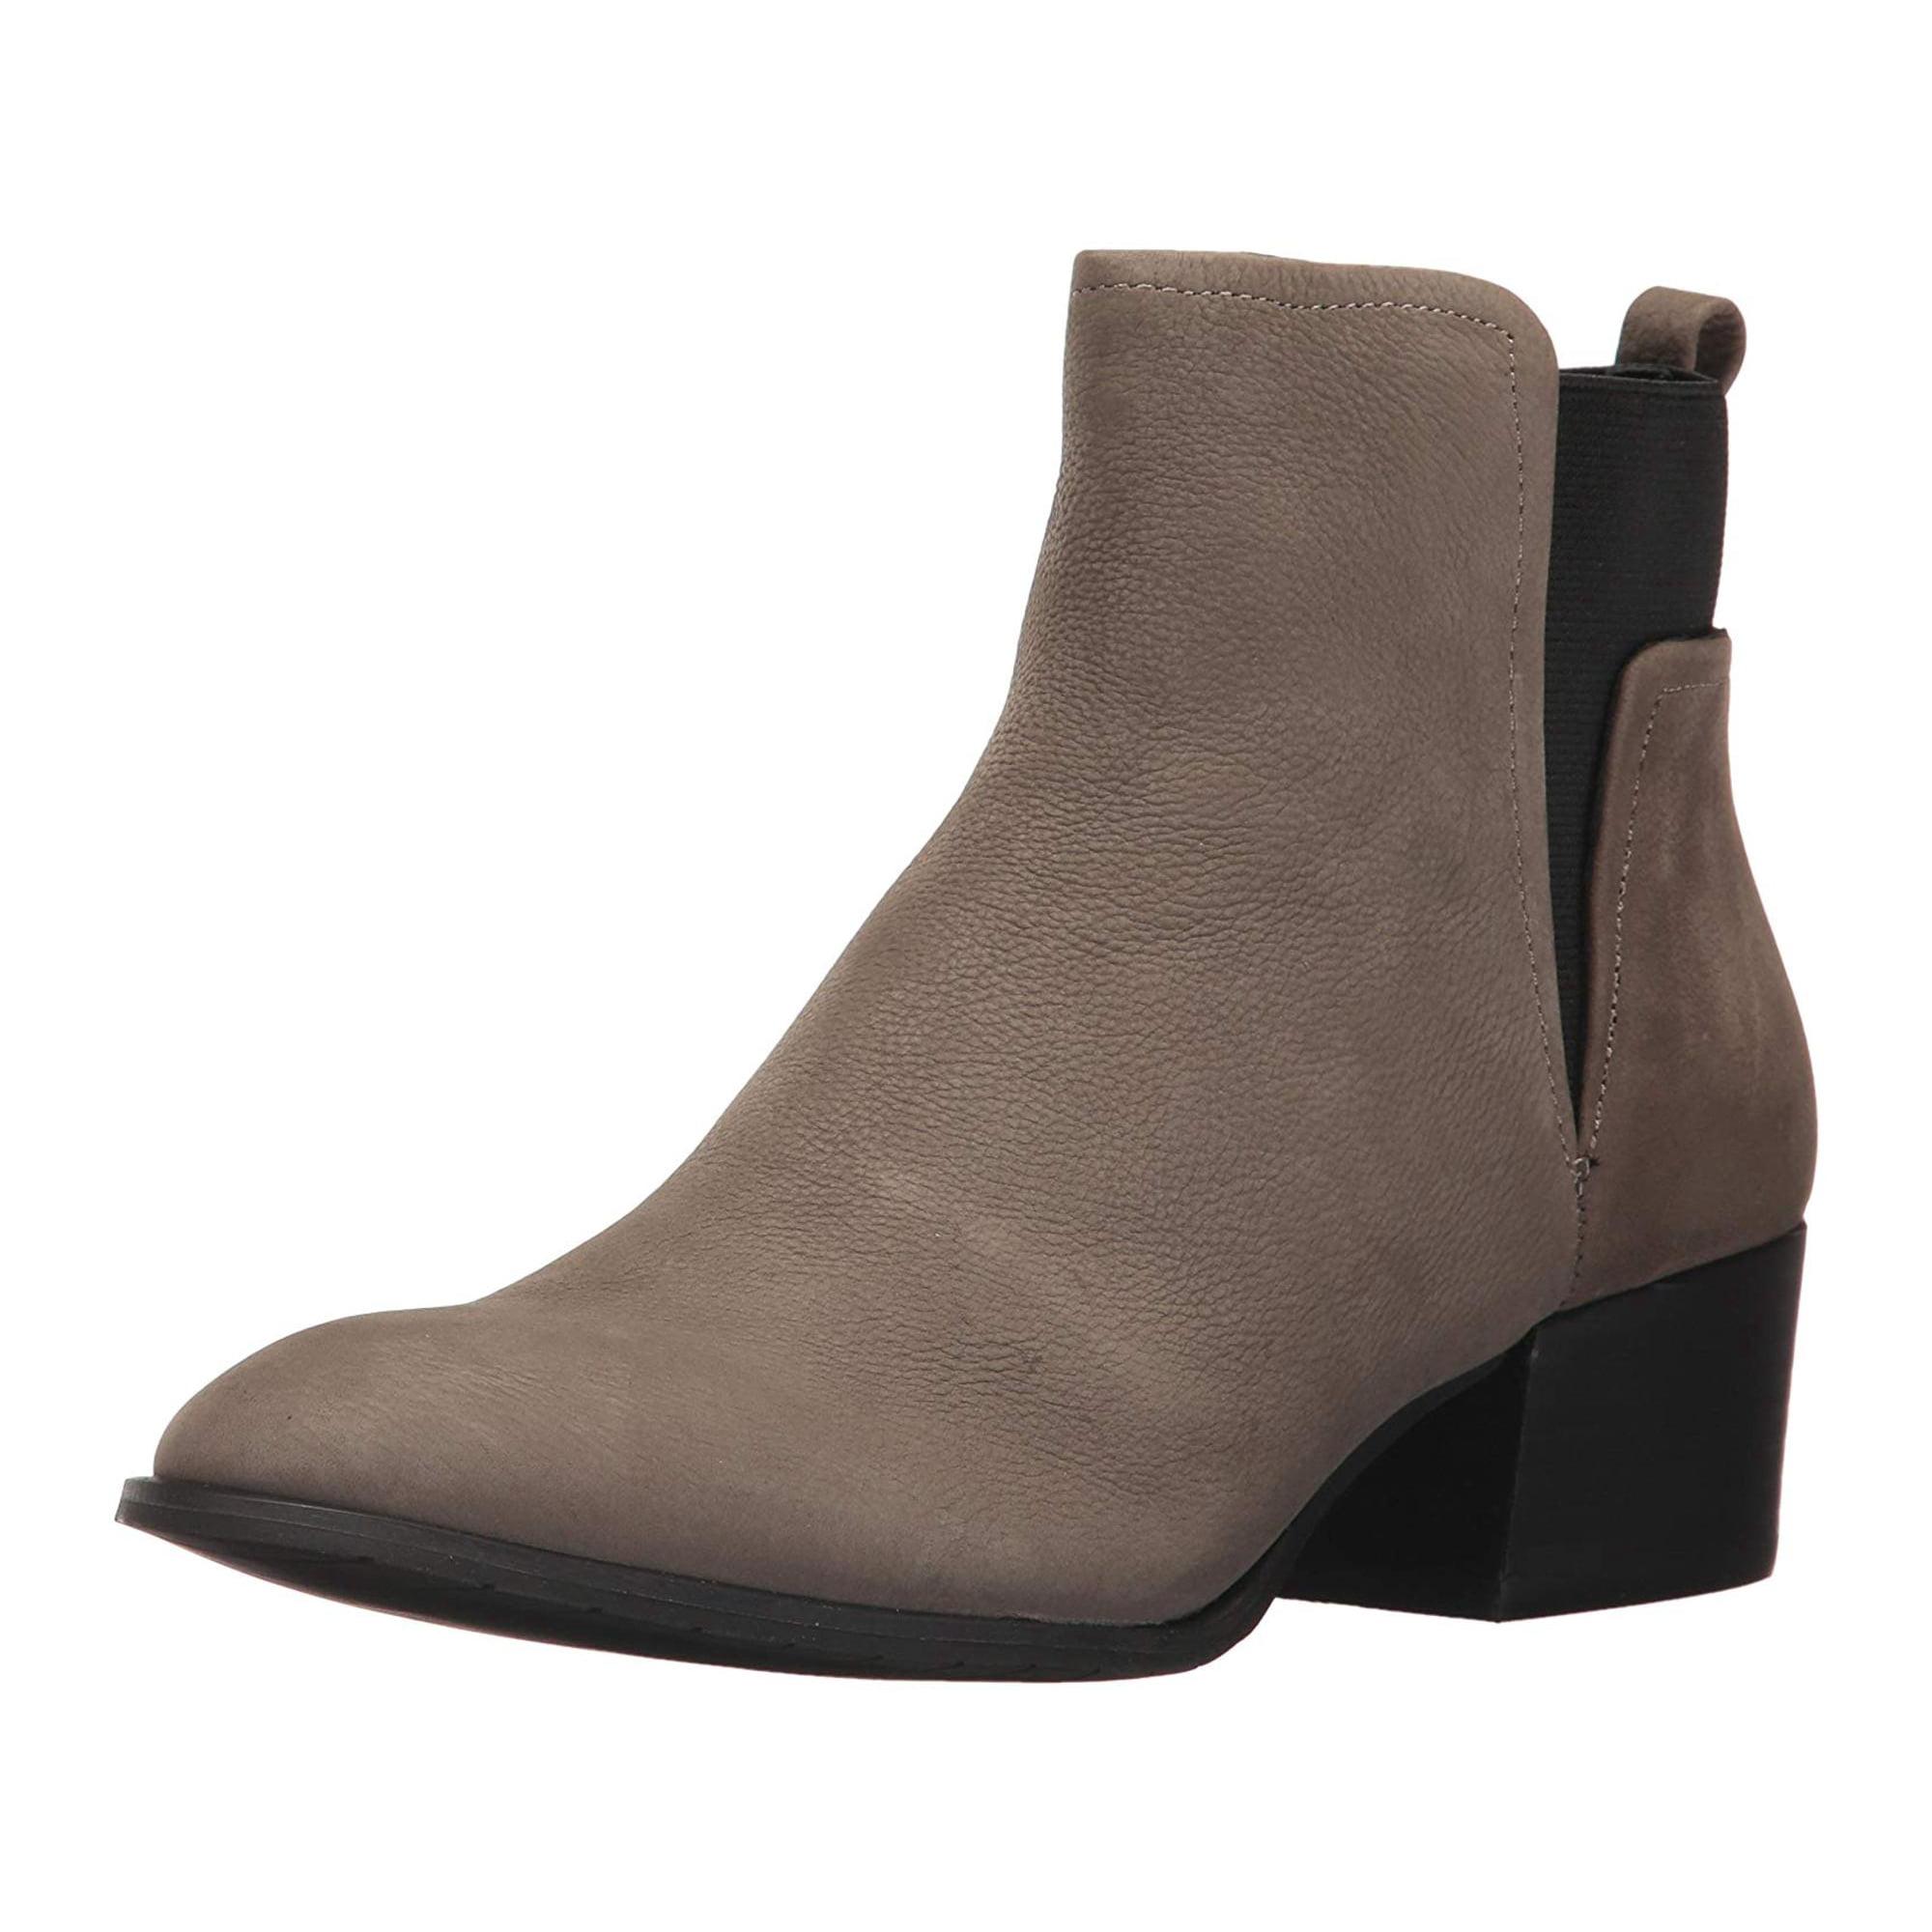 167c23dfa Kenneth Cole New York Women's Artie Pull Low Heel Nubuck Ankle | Walmart  Canada